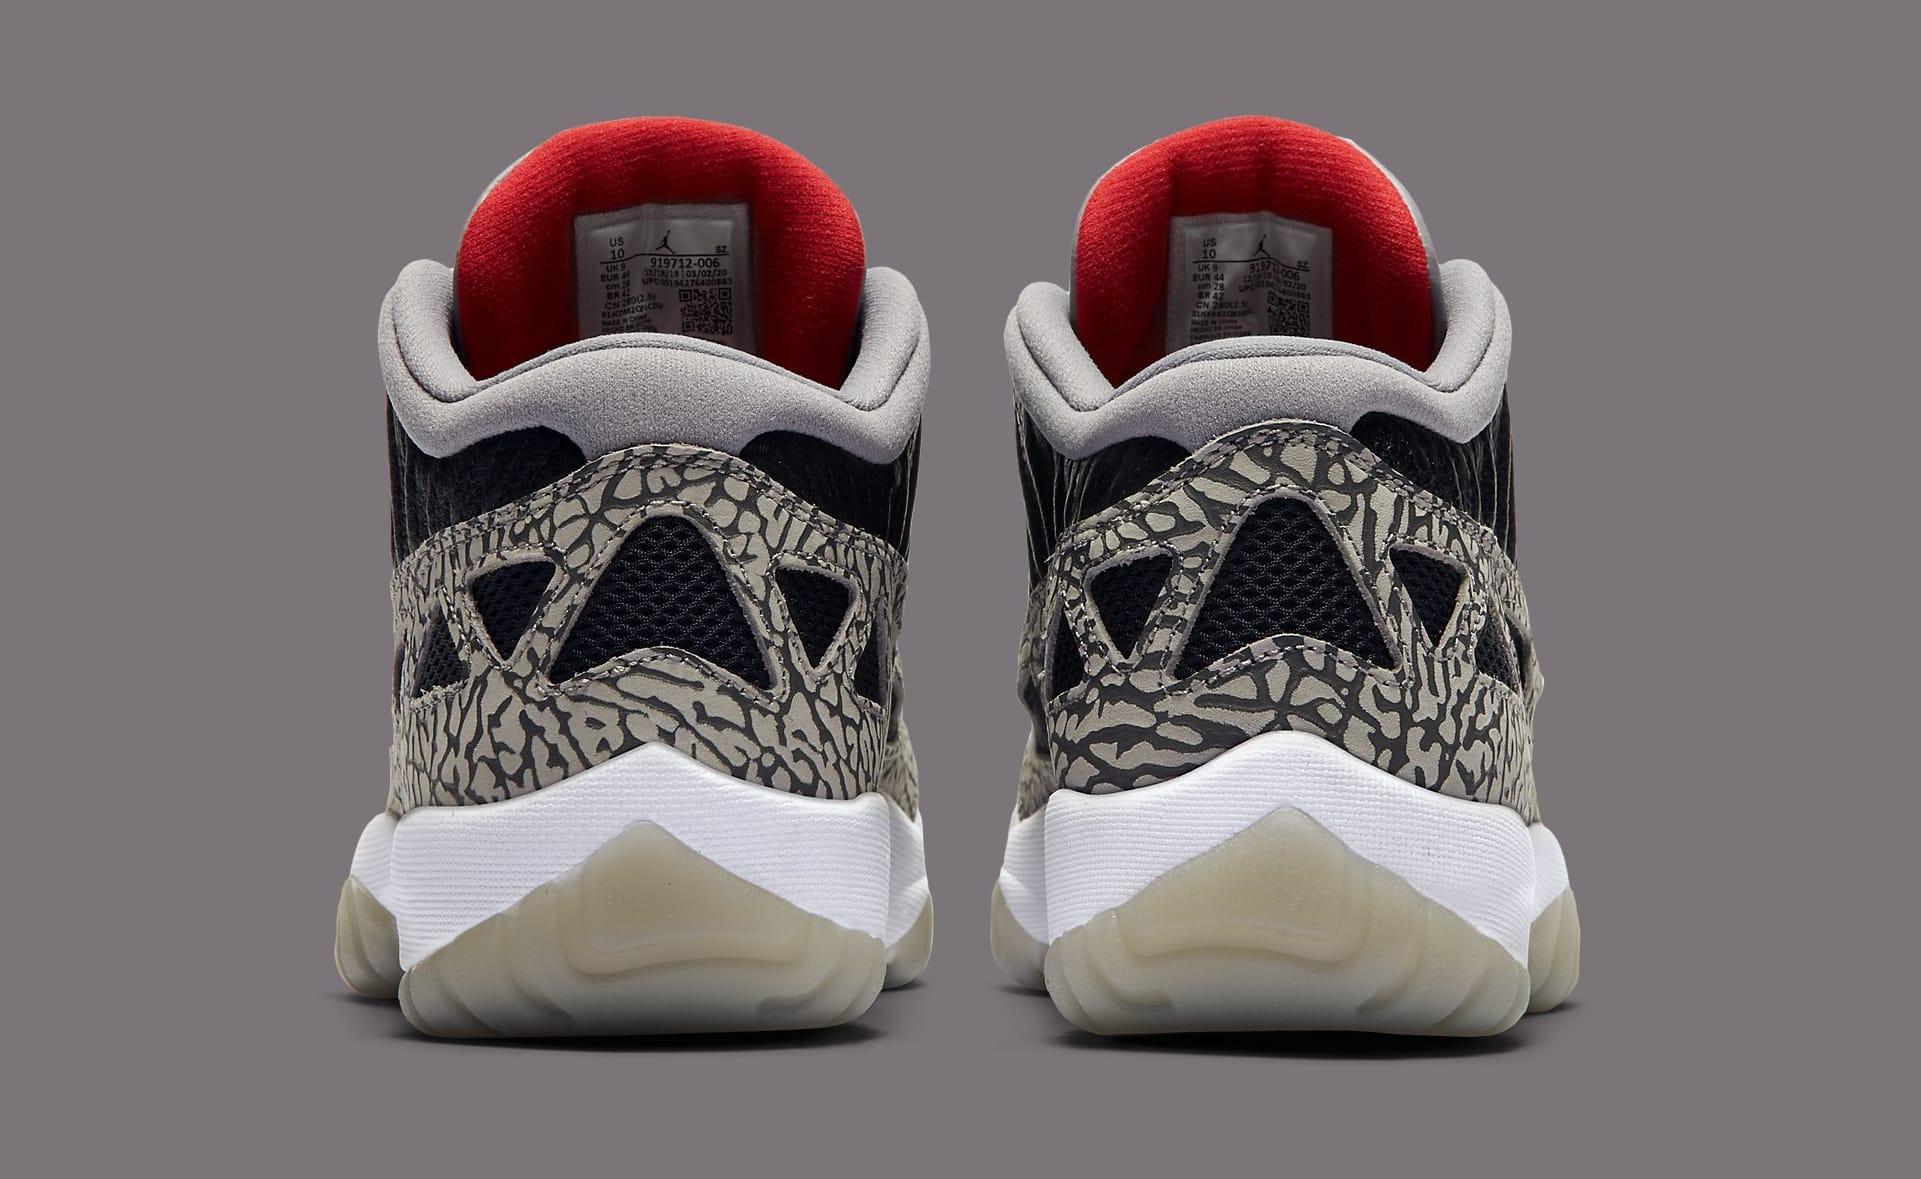 Air Jordan 11 Low Ie Black Cement Unveiled Release Info